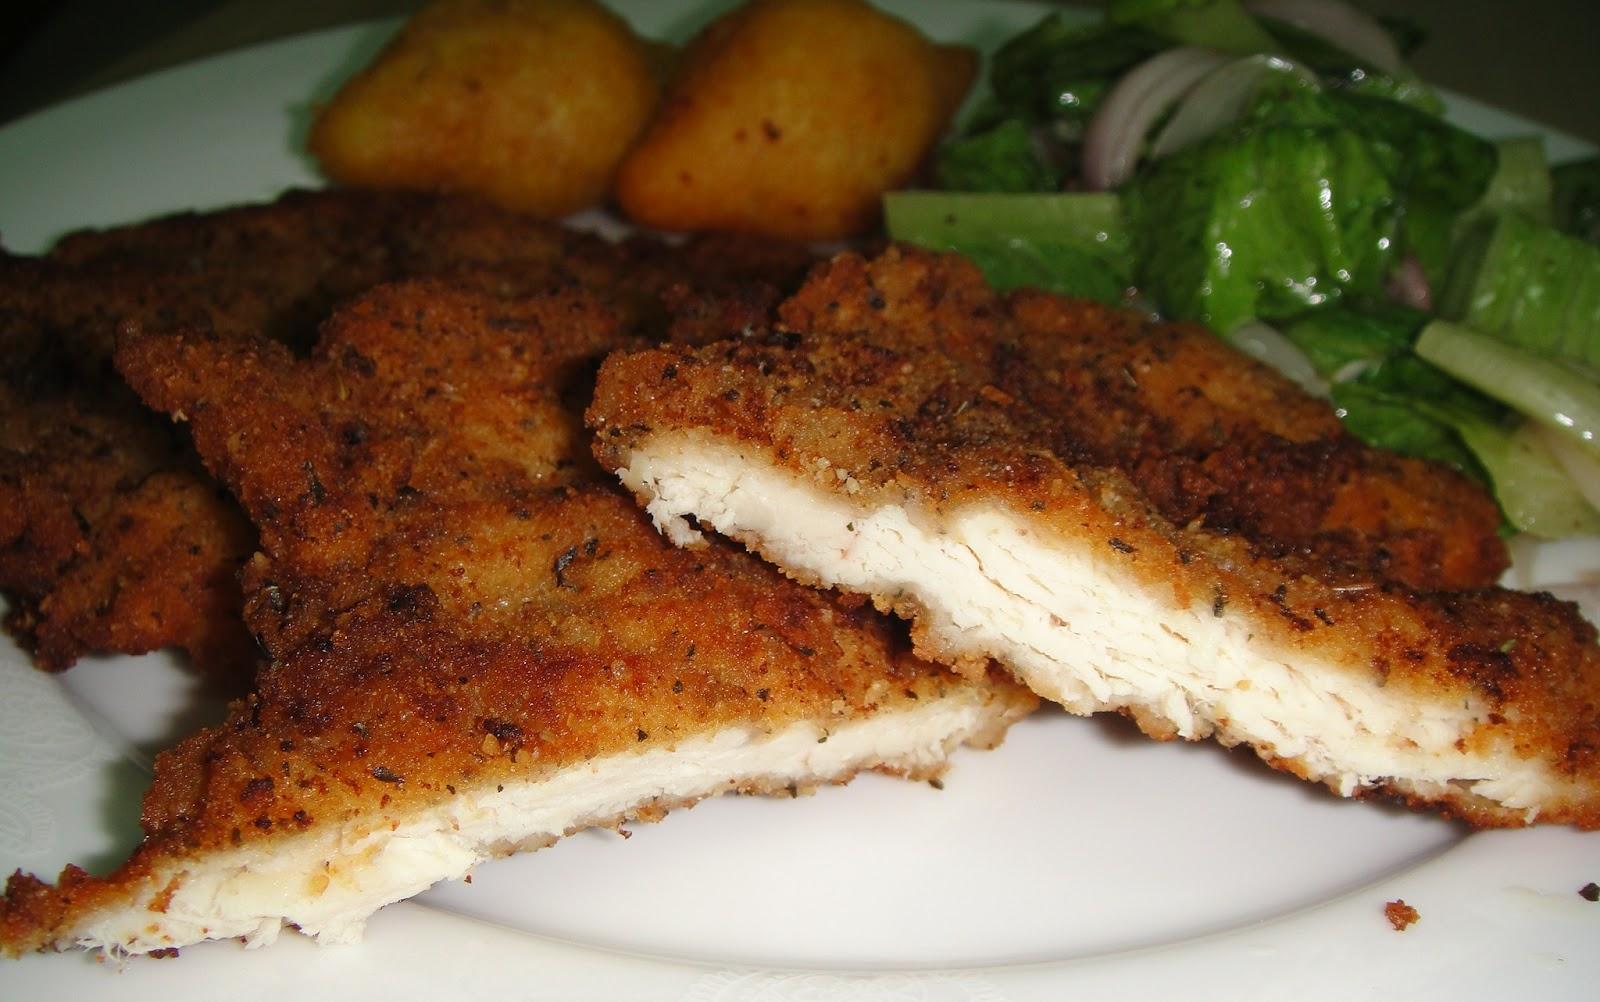 Maryam S Culinary Wonders 168 Chicken Escalope Milanese